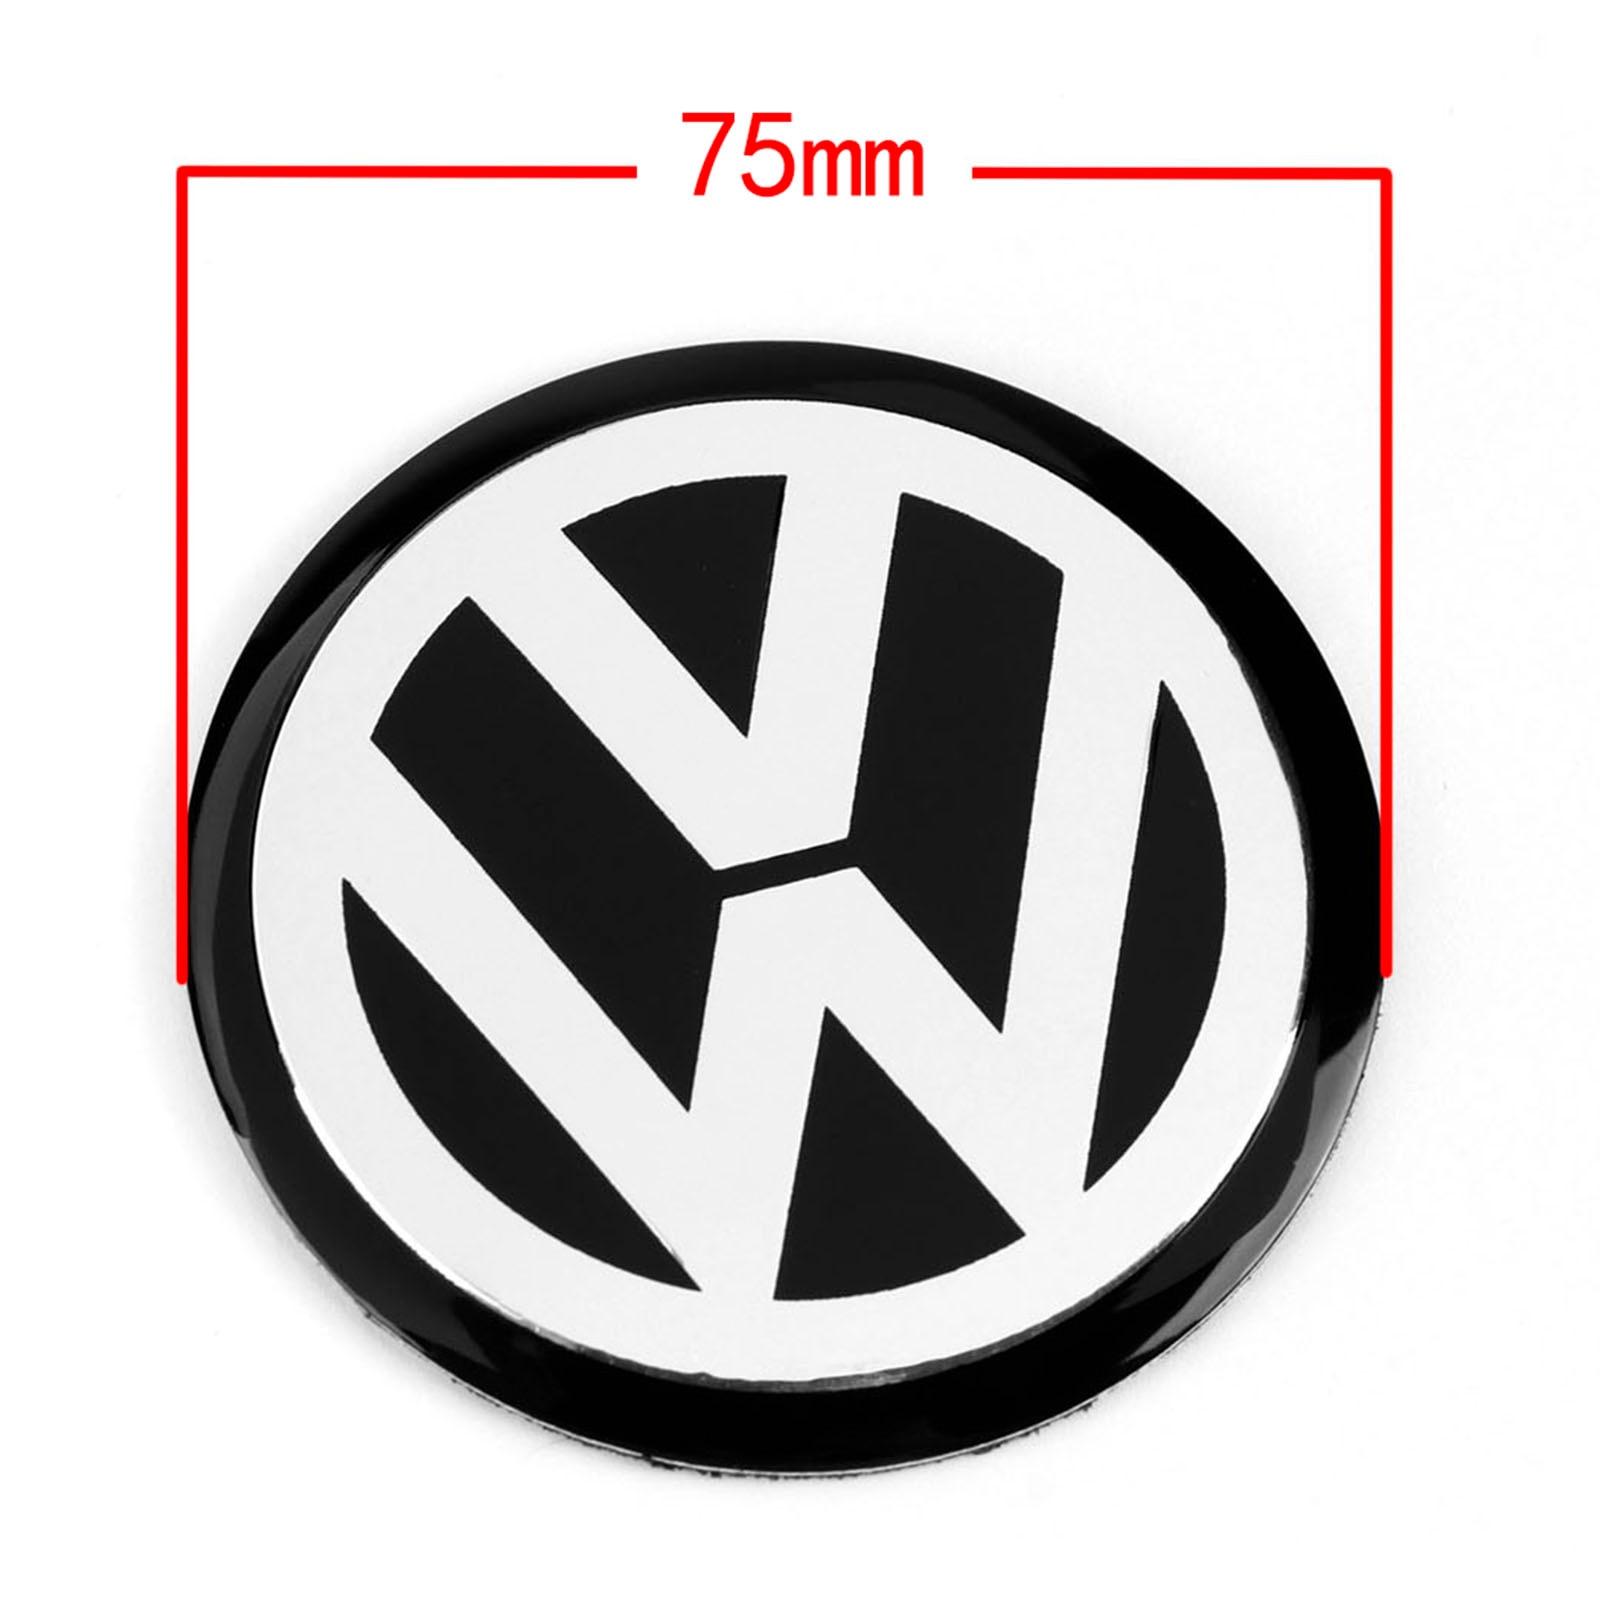 4 шт., наклейки на колеса для VW, 75 мм|Наклейки на автомобиль| | АлиЭкспресс